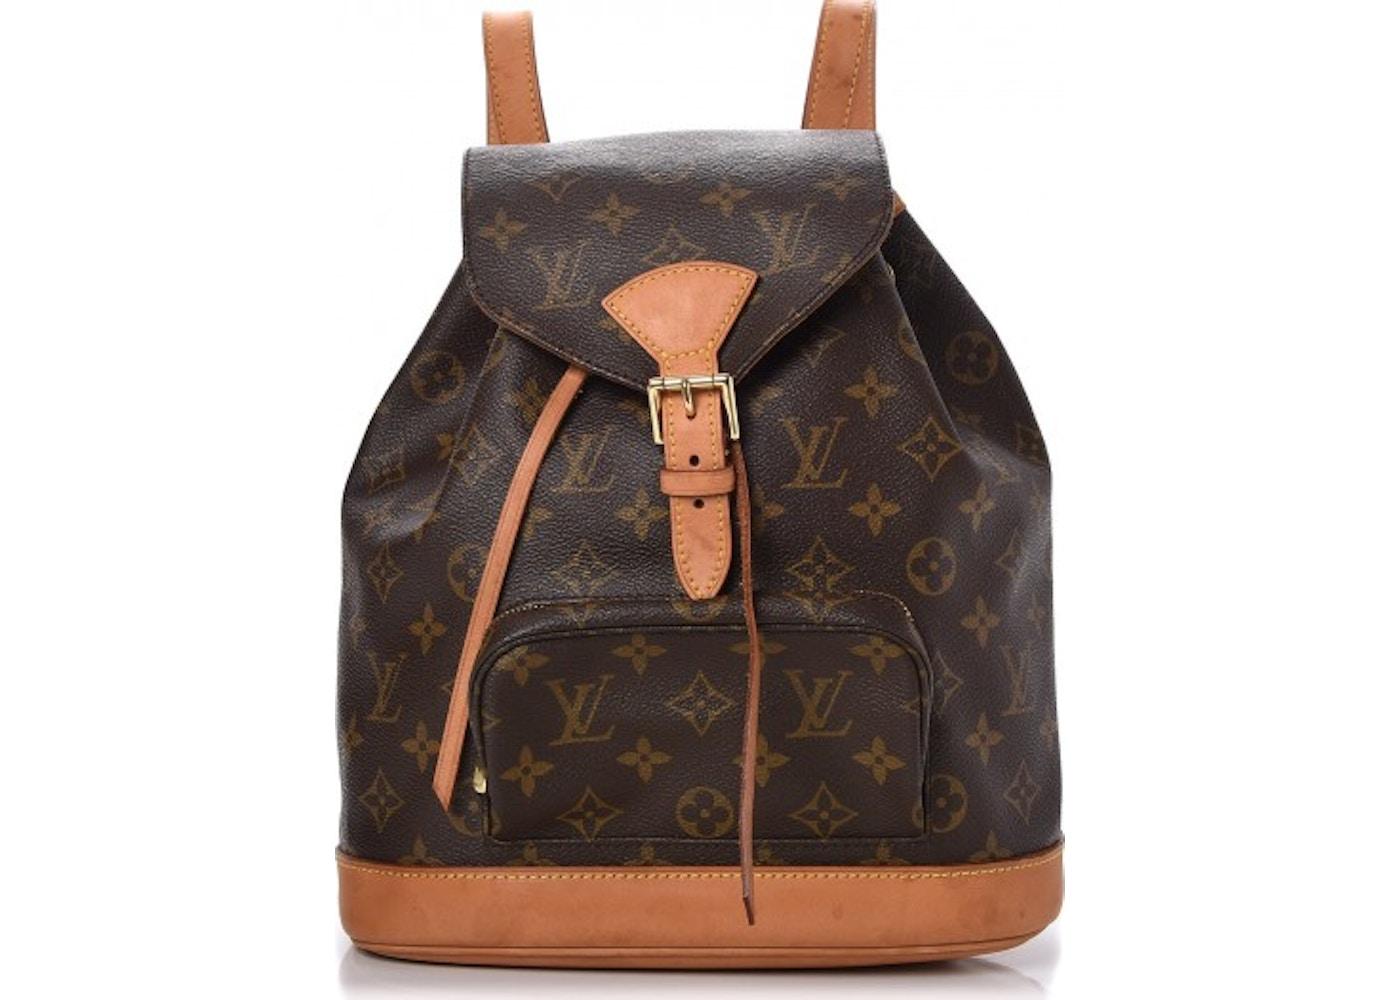 d88f11d22d9b Louis Vuitton Backpack Montsouris Monogram MM Brown. Monogram MM Brown